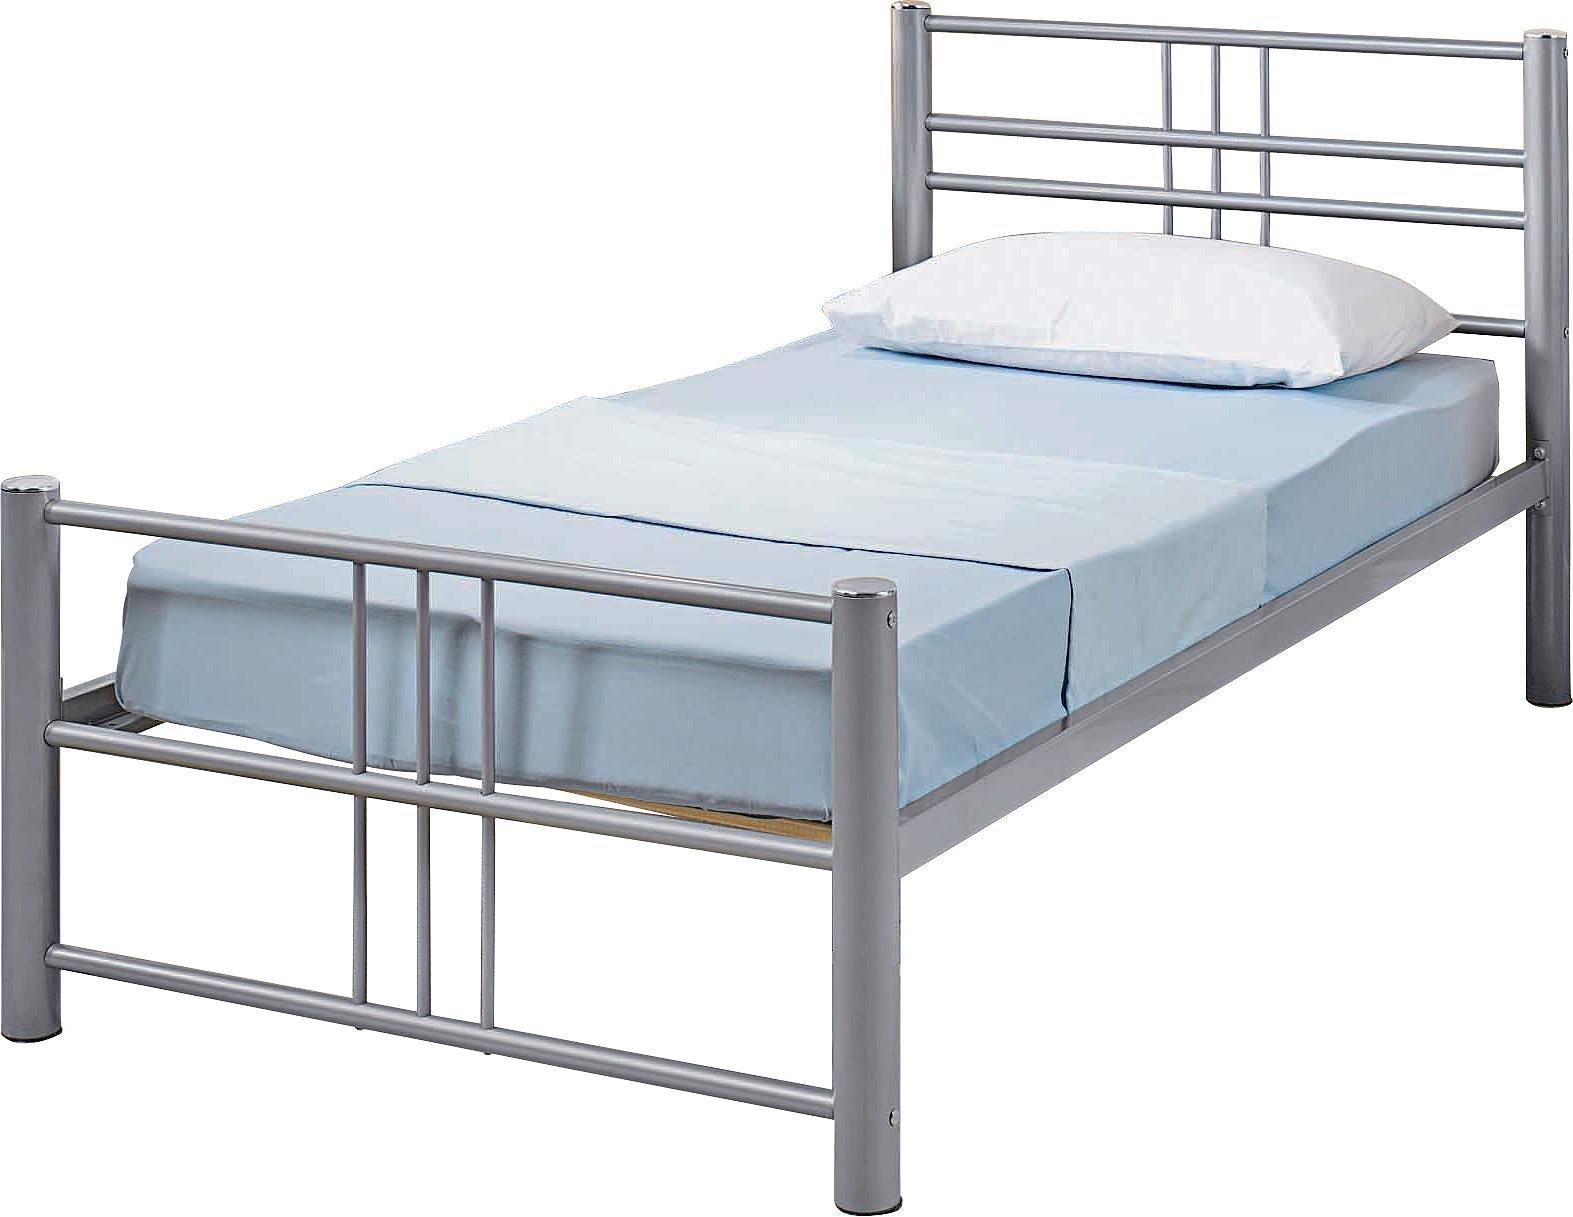 Buy Atlas Metal Single Bed Frame Silver At Argos Co Uk Your Online Shop For Bed Frames Beds